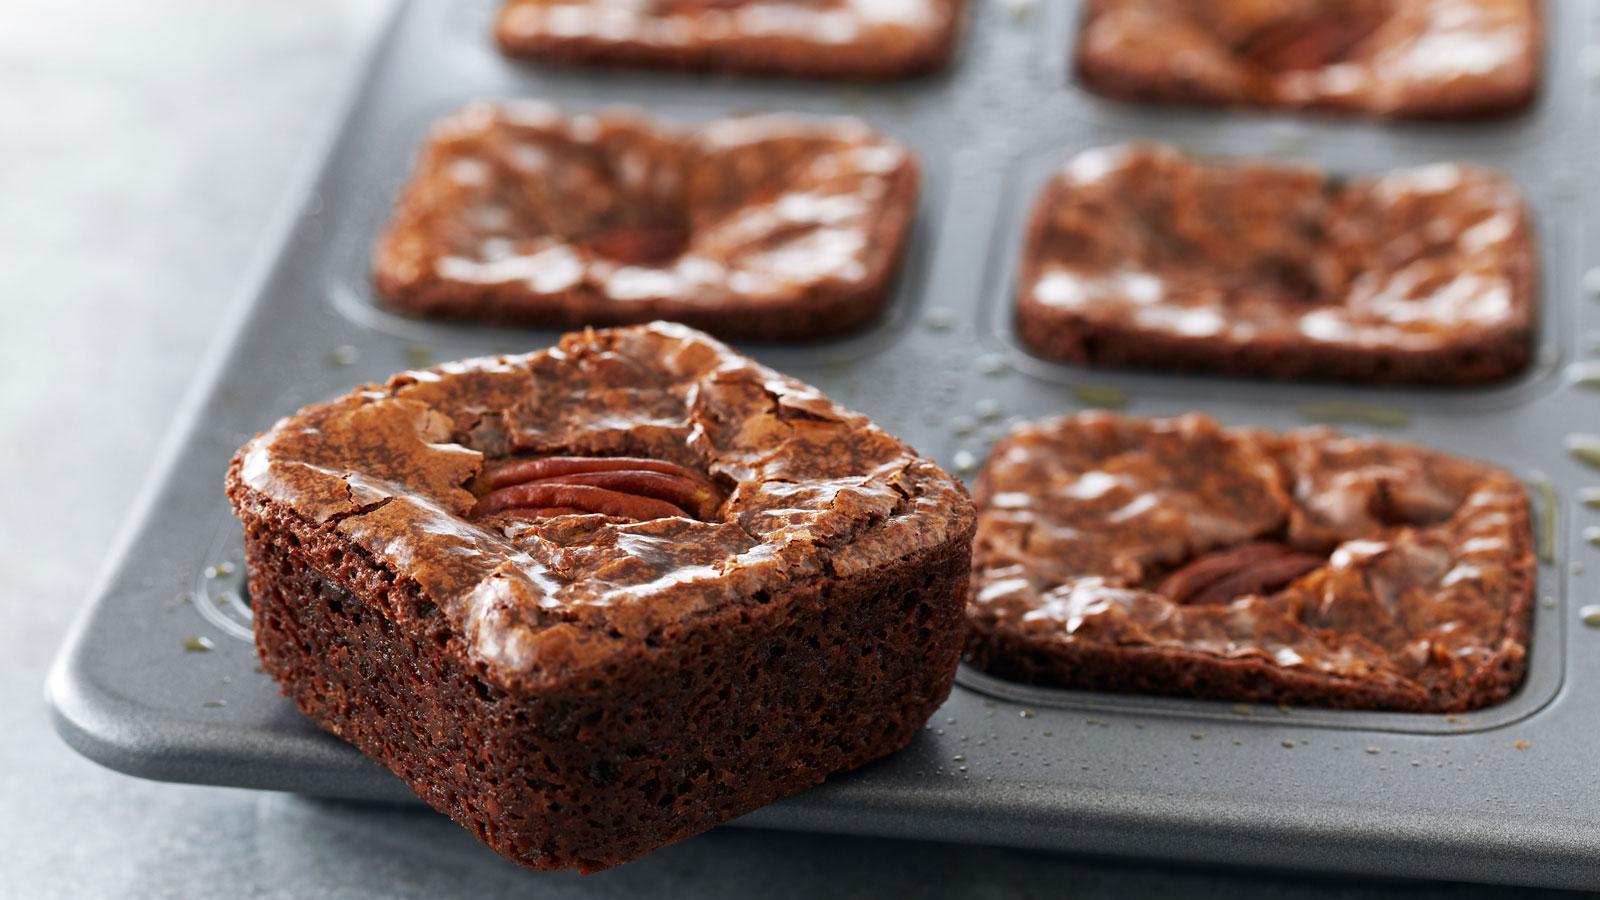 Brownie De Chocolate Fudge Brownie Anna Olson Receta